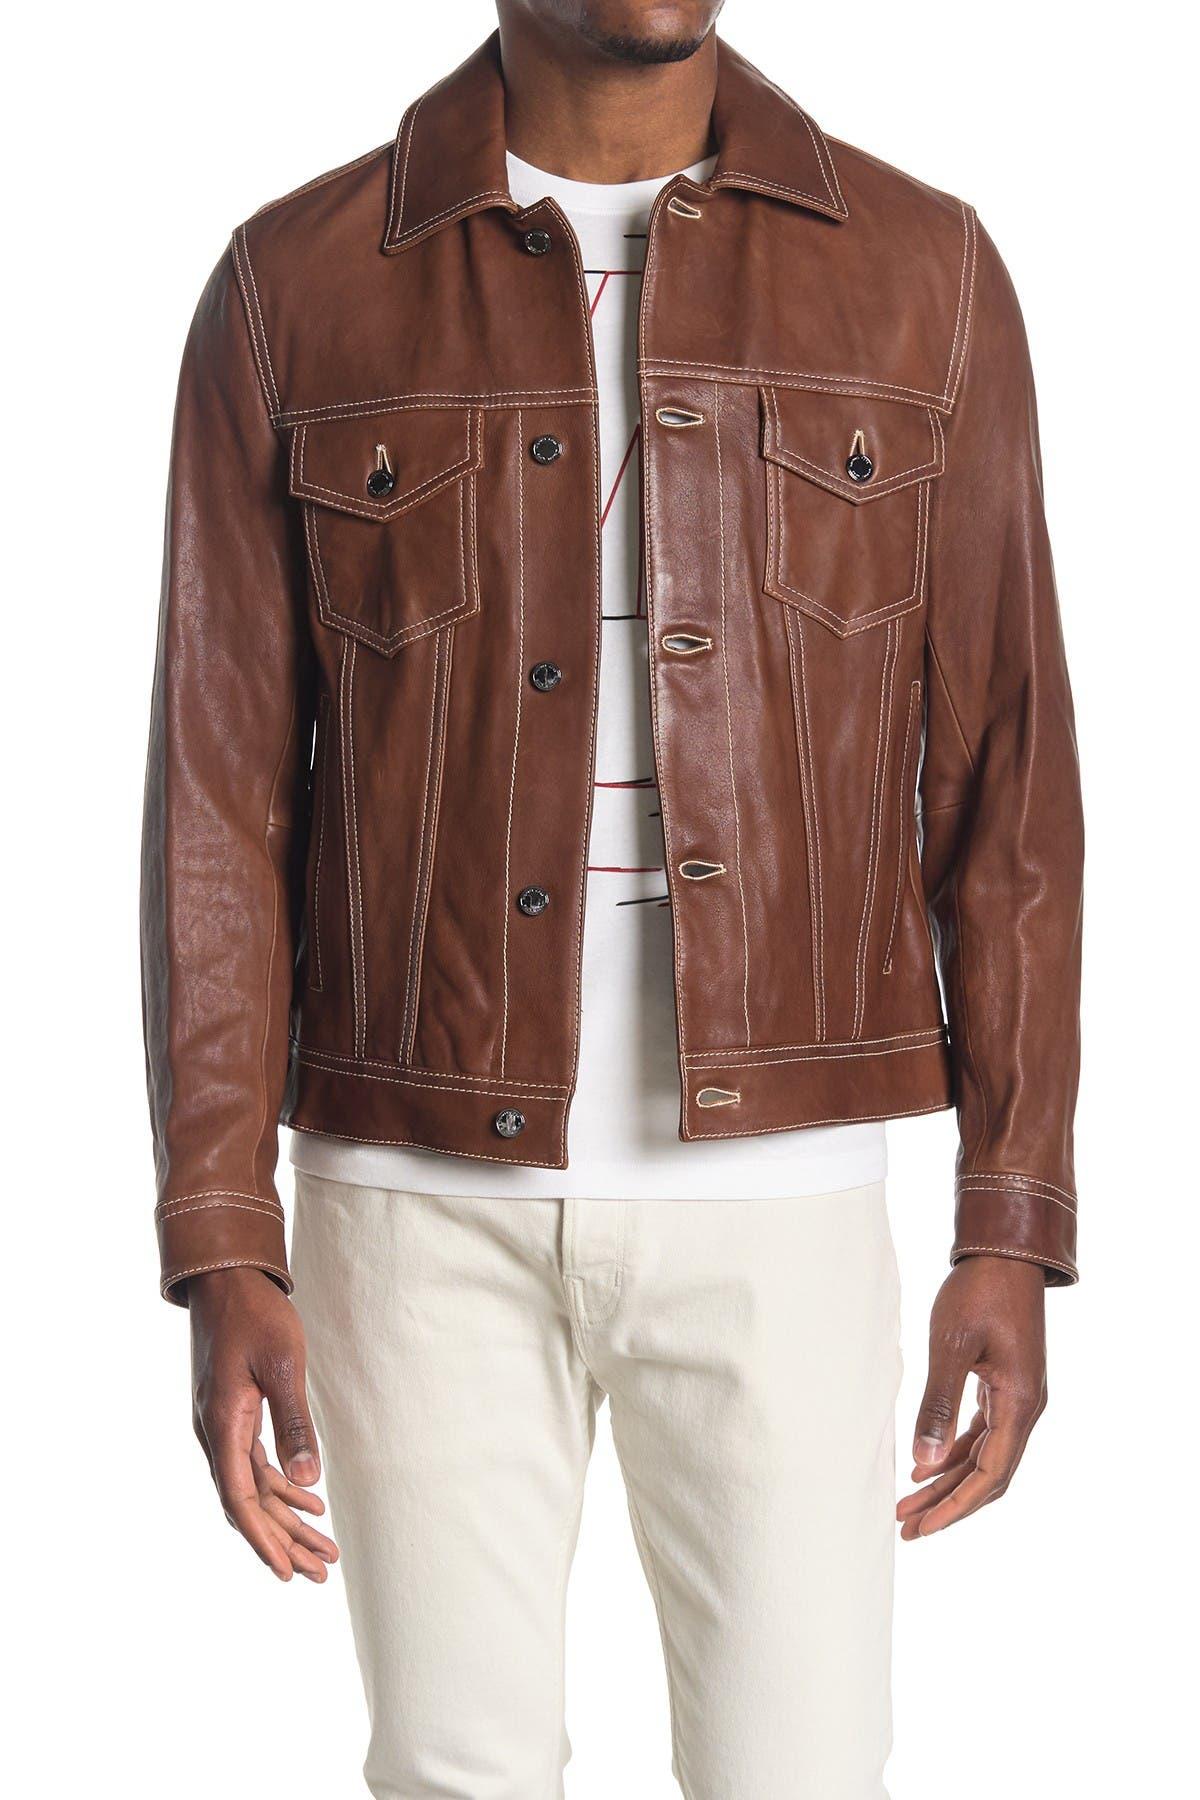 Image of Michael Kors Leather Trucker Jacket